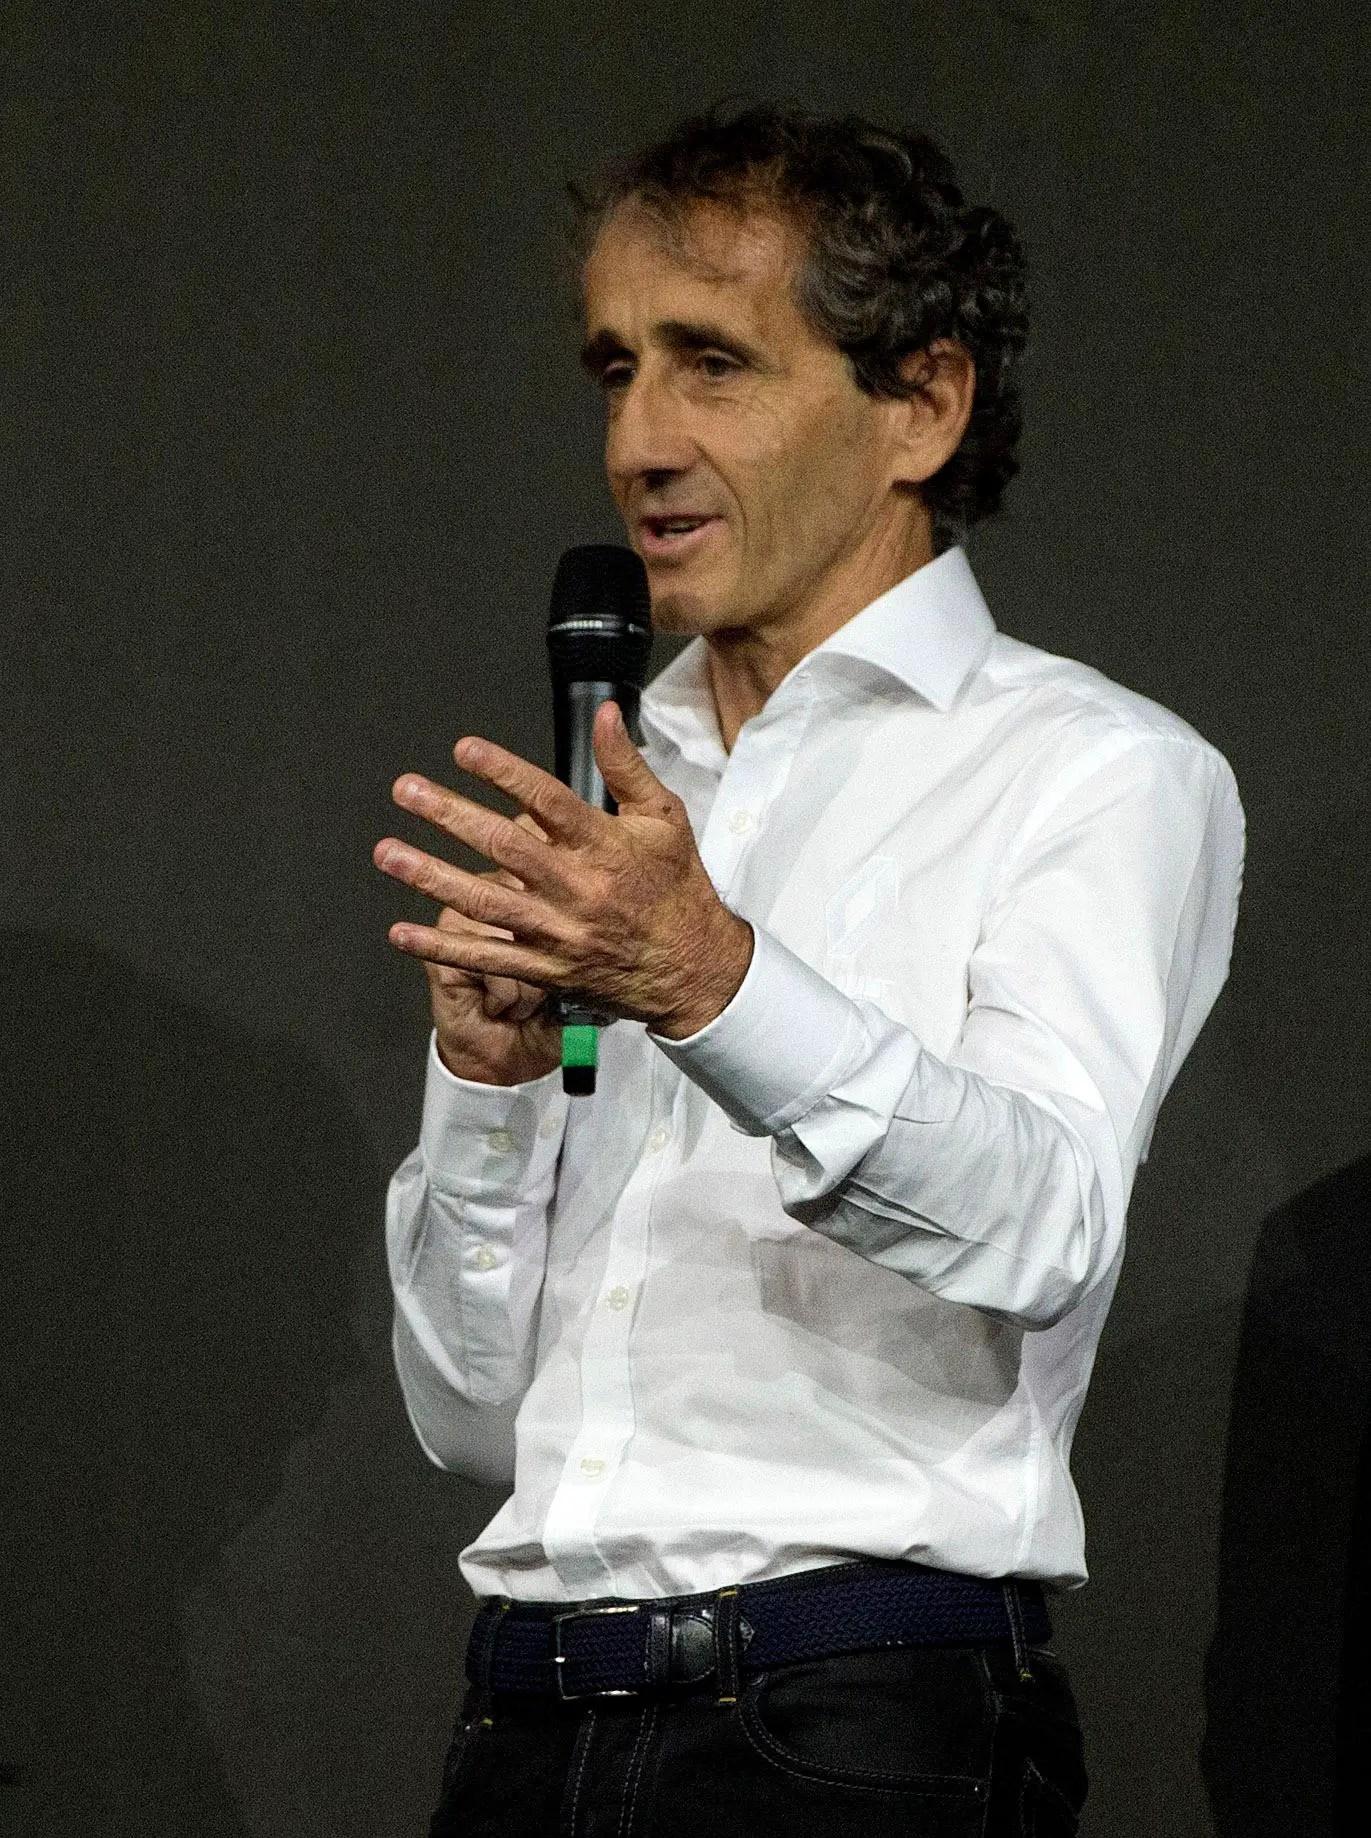 Prost Urges F1 Safety Improvements